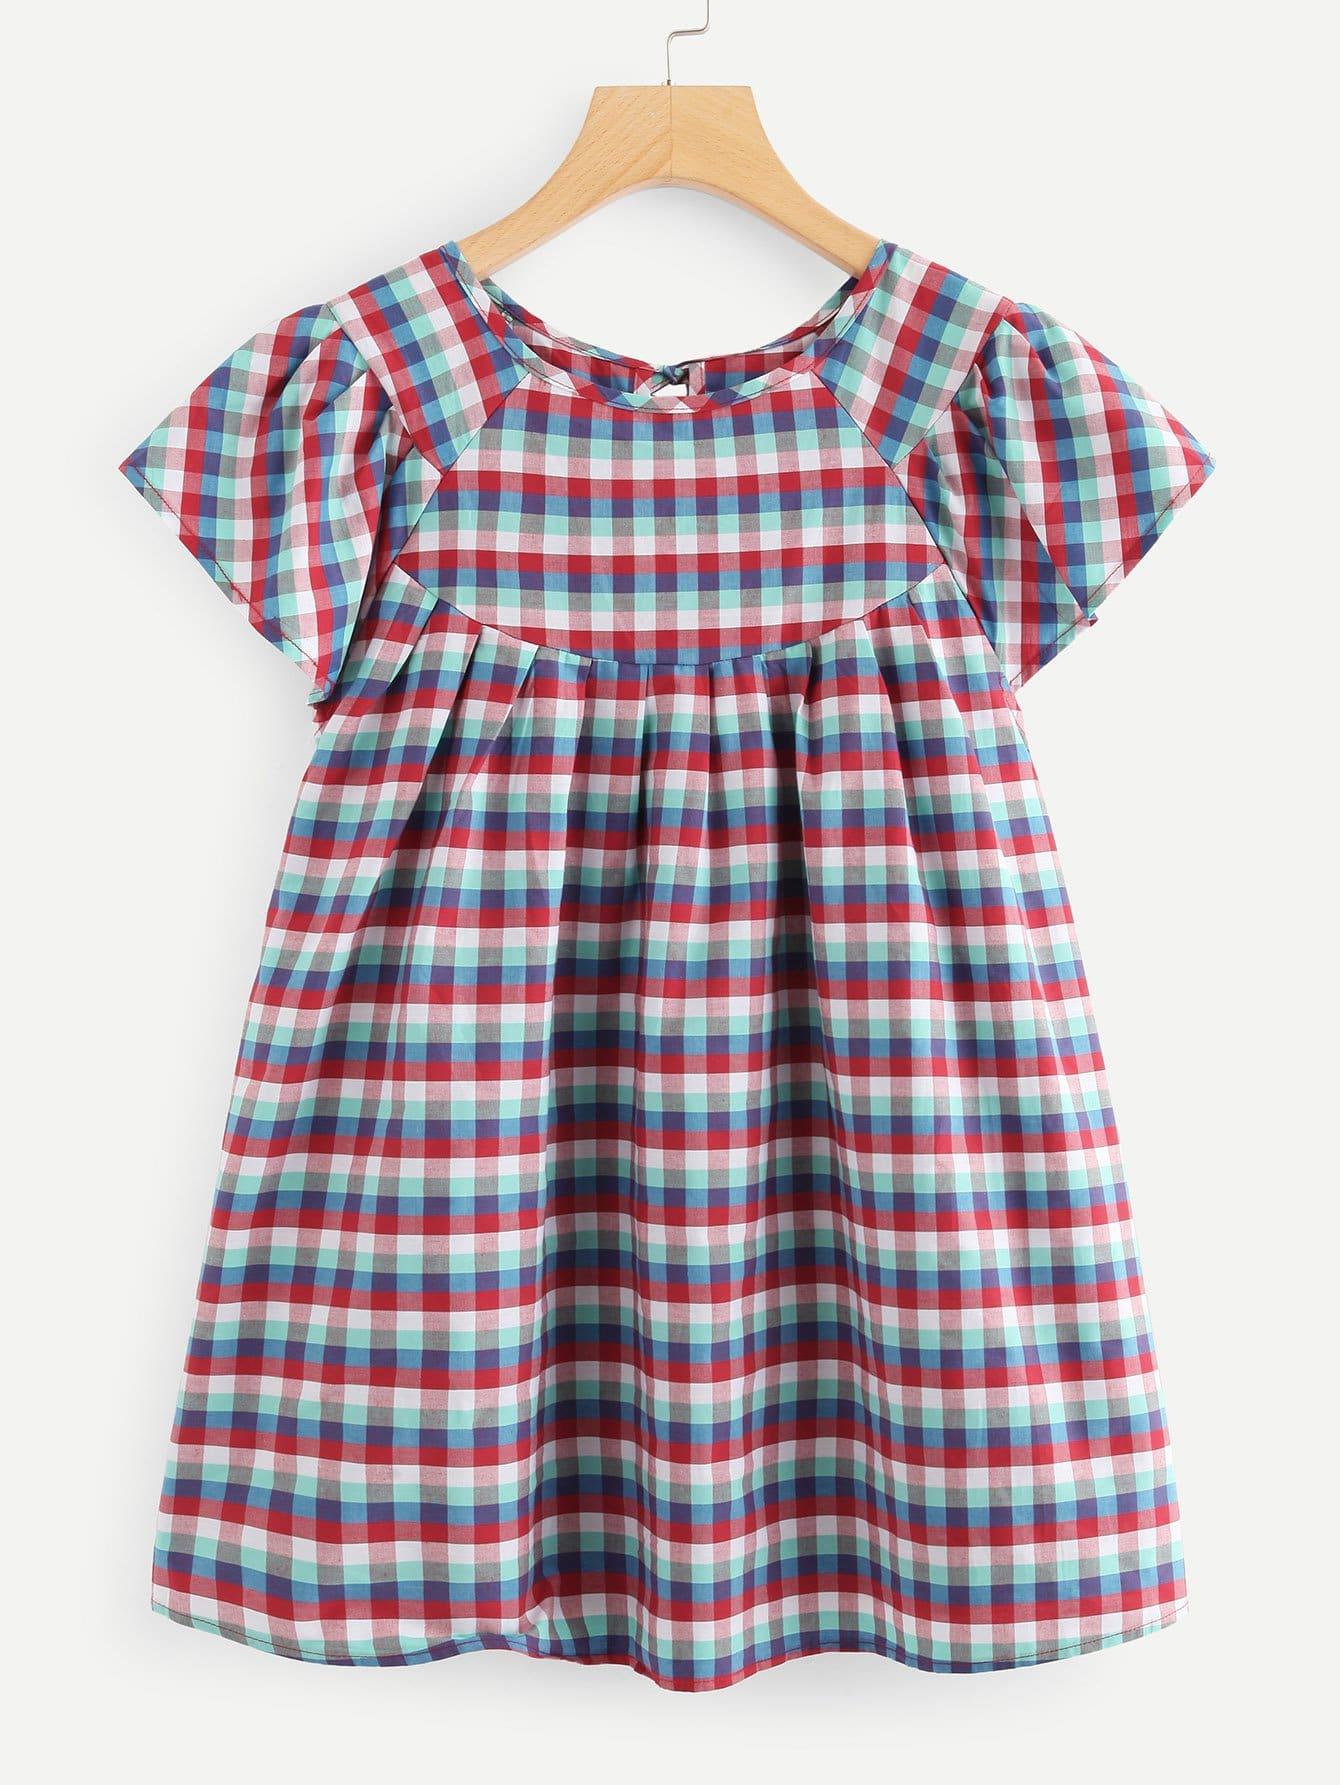 Raglan Sleeve Plaid Smock Top raglan sleeve smock gingham dress